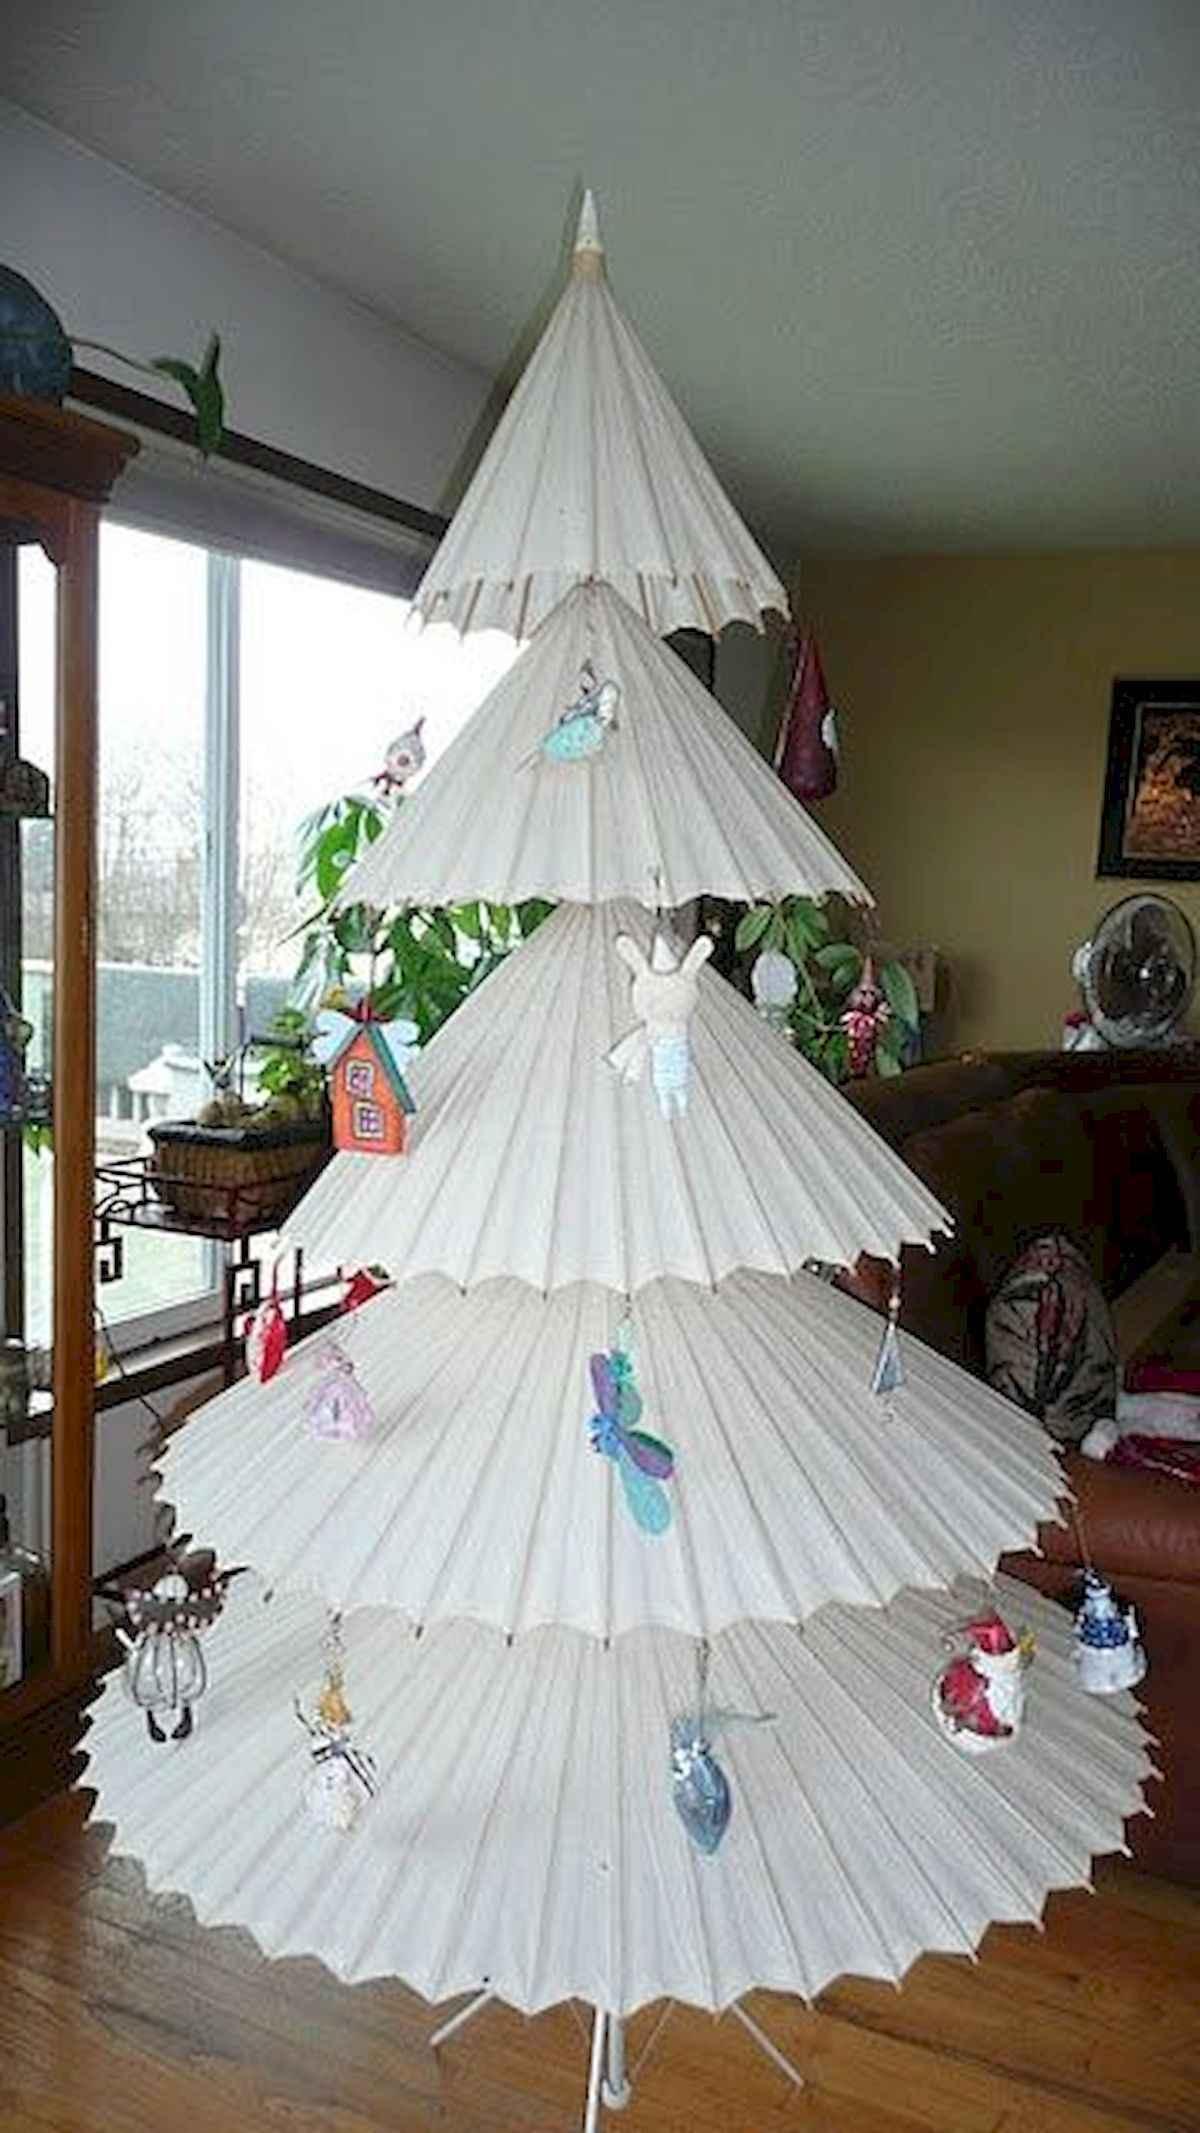 40 unique christmas tree ideas decorations (17)